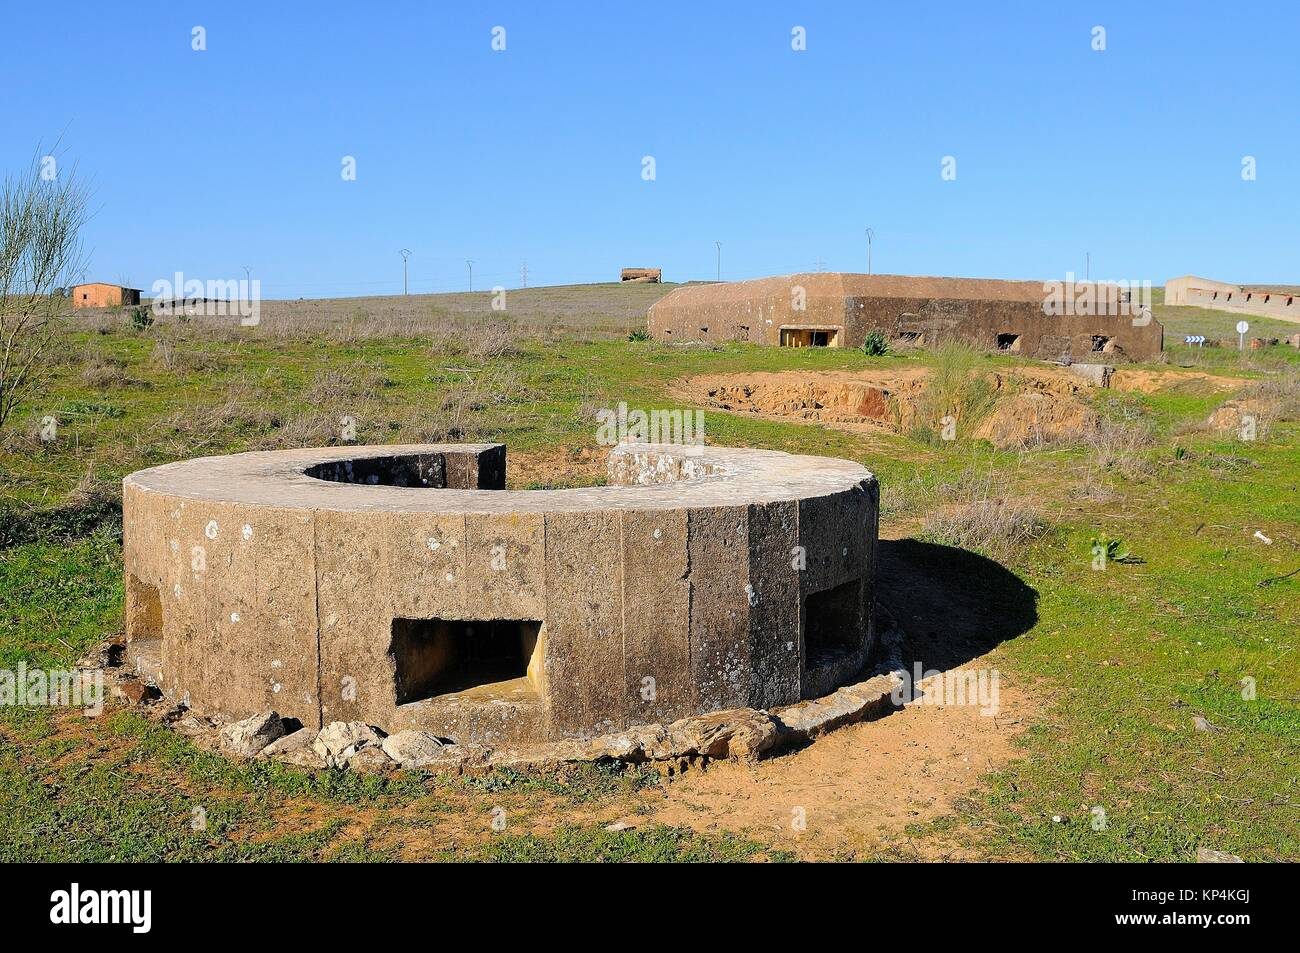 Bunker remains stock photos bunker remains stock images alamy - Casas de don pedro badajoz ...